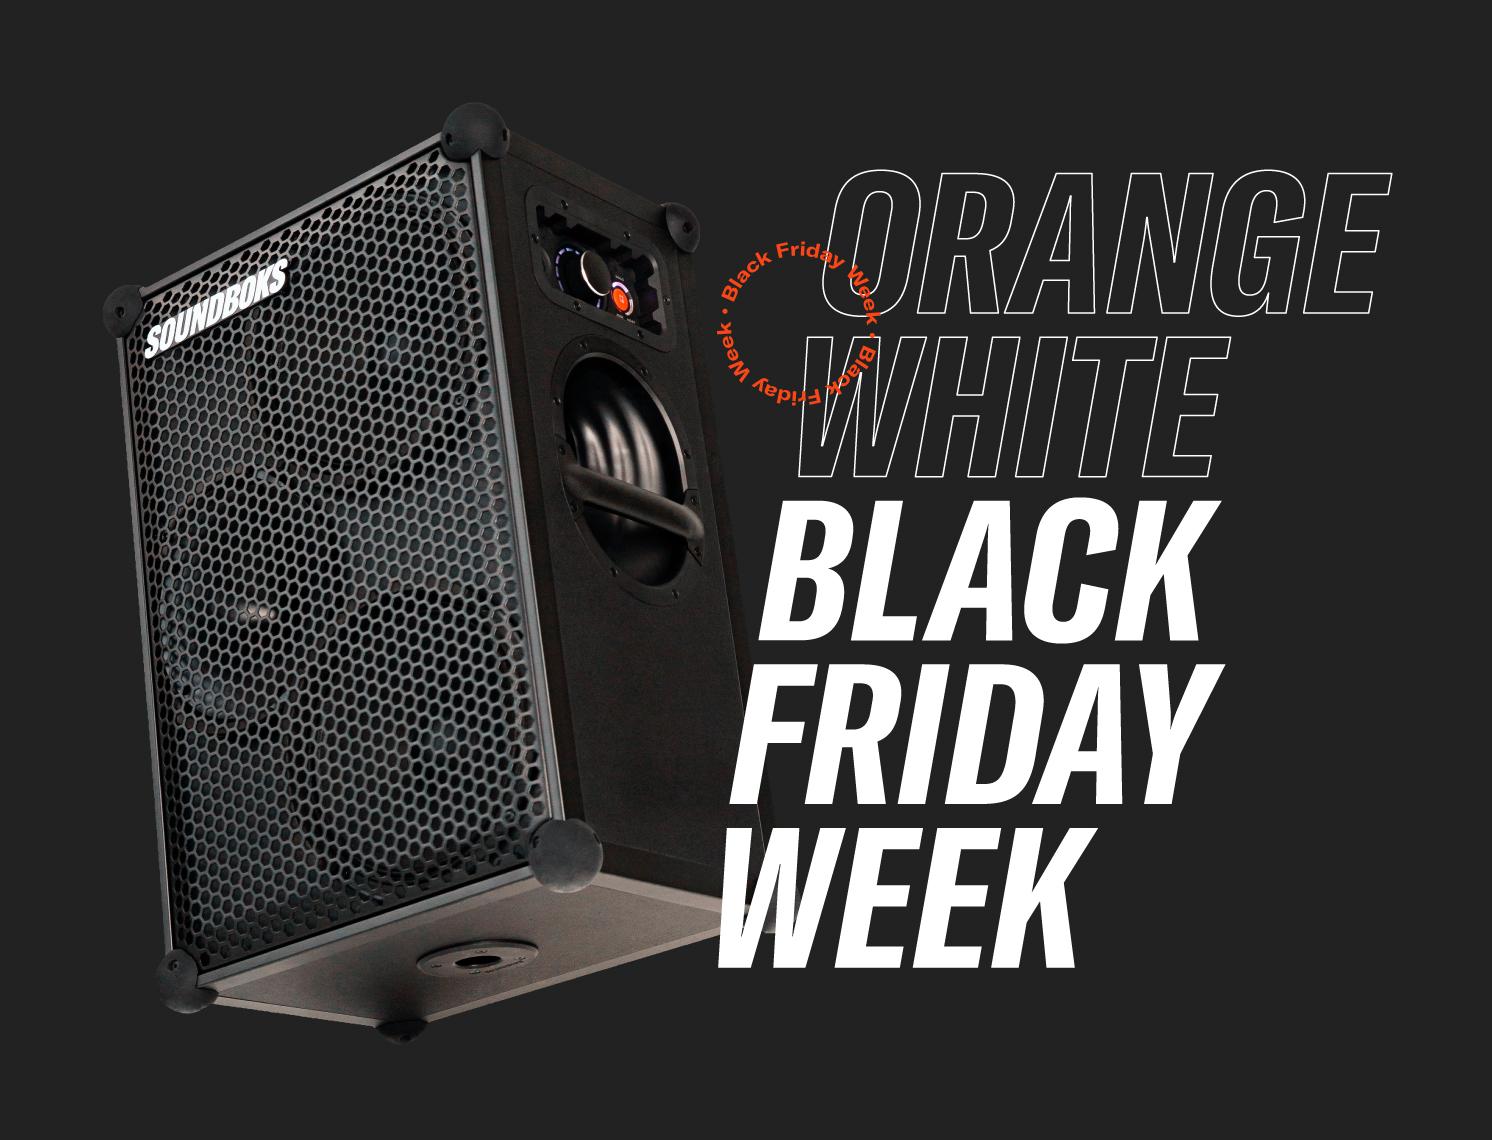 SOUNDBOKS Black Friday Ad, SOUNDBOKS with a black background